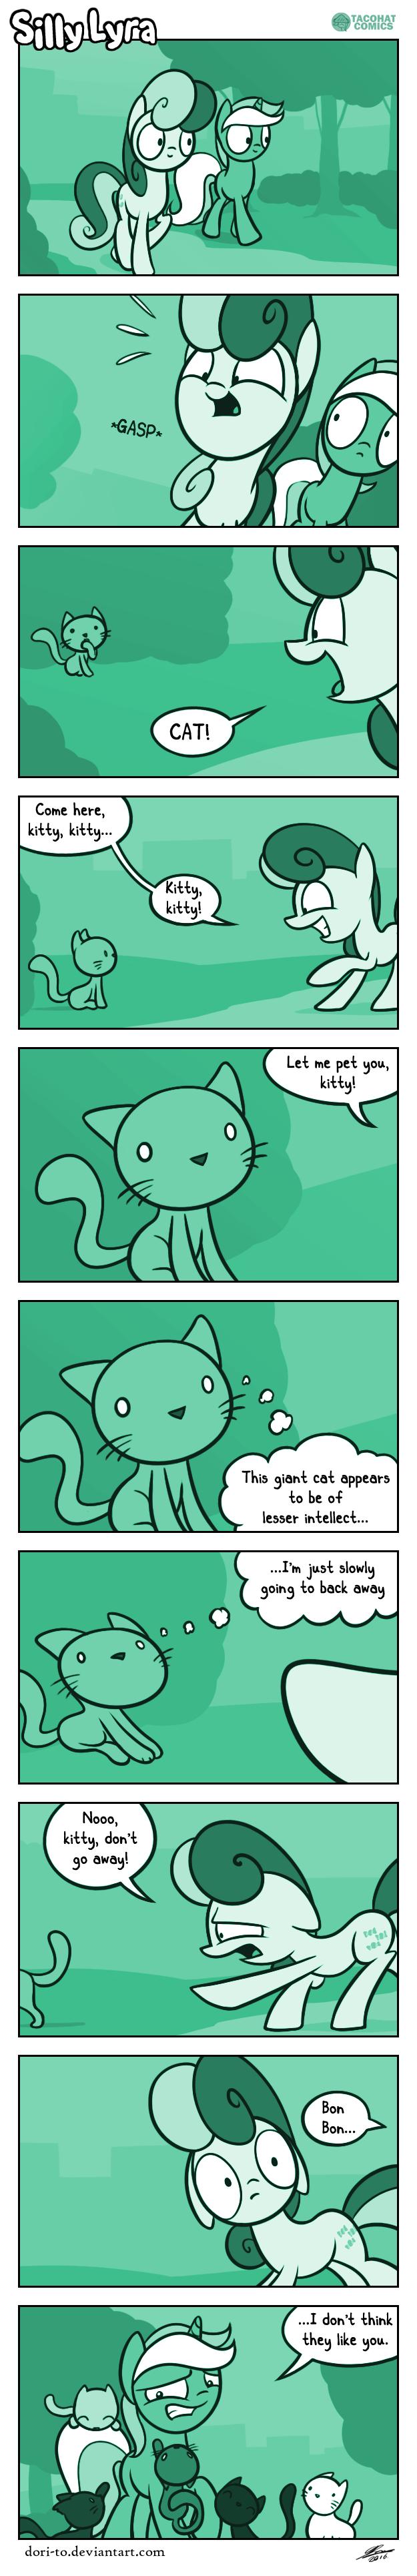 Silly Lyra - Catastrophe